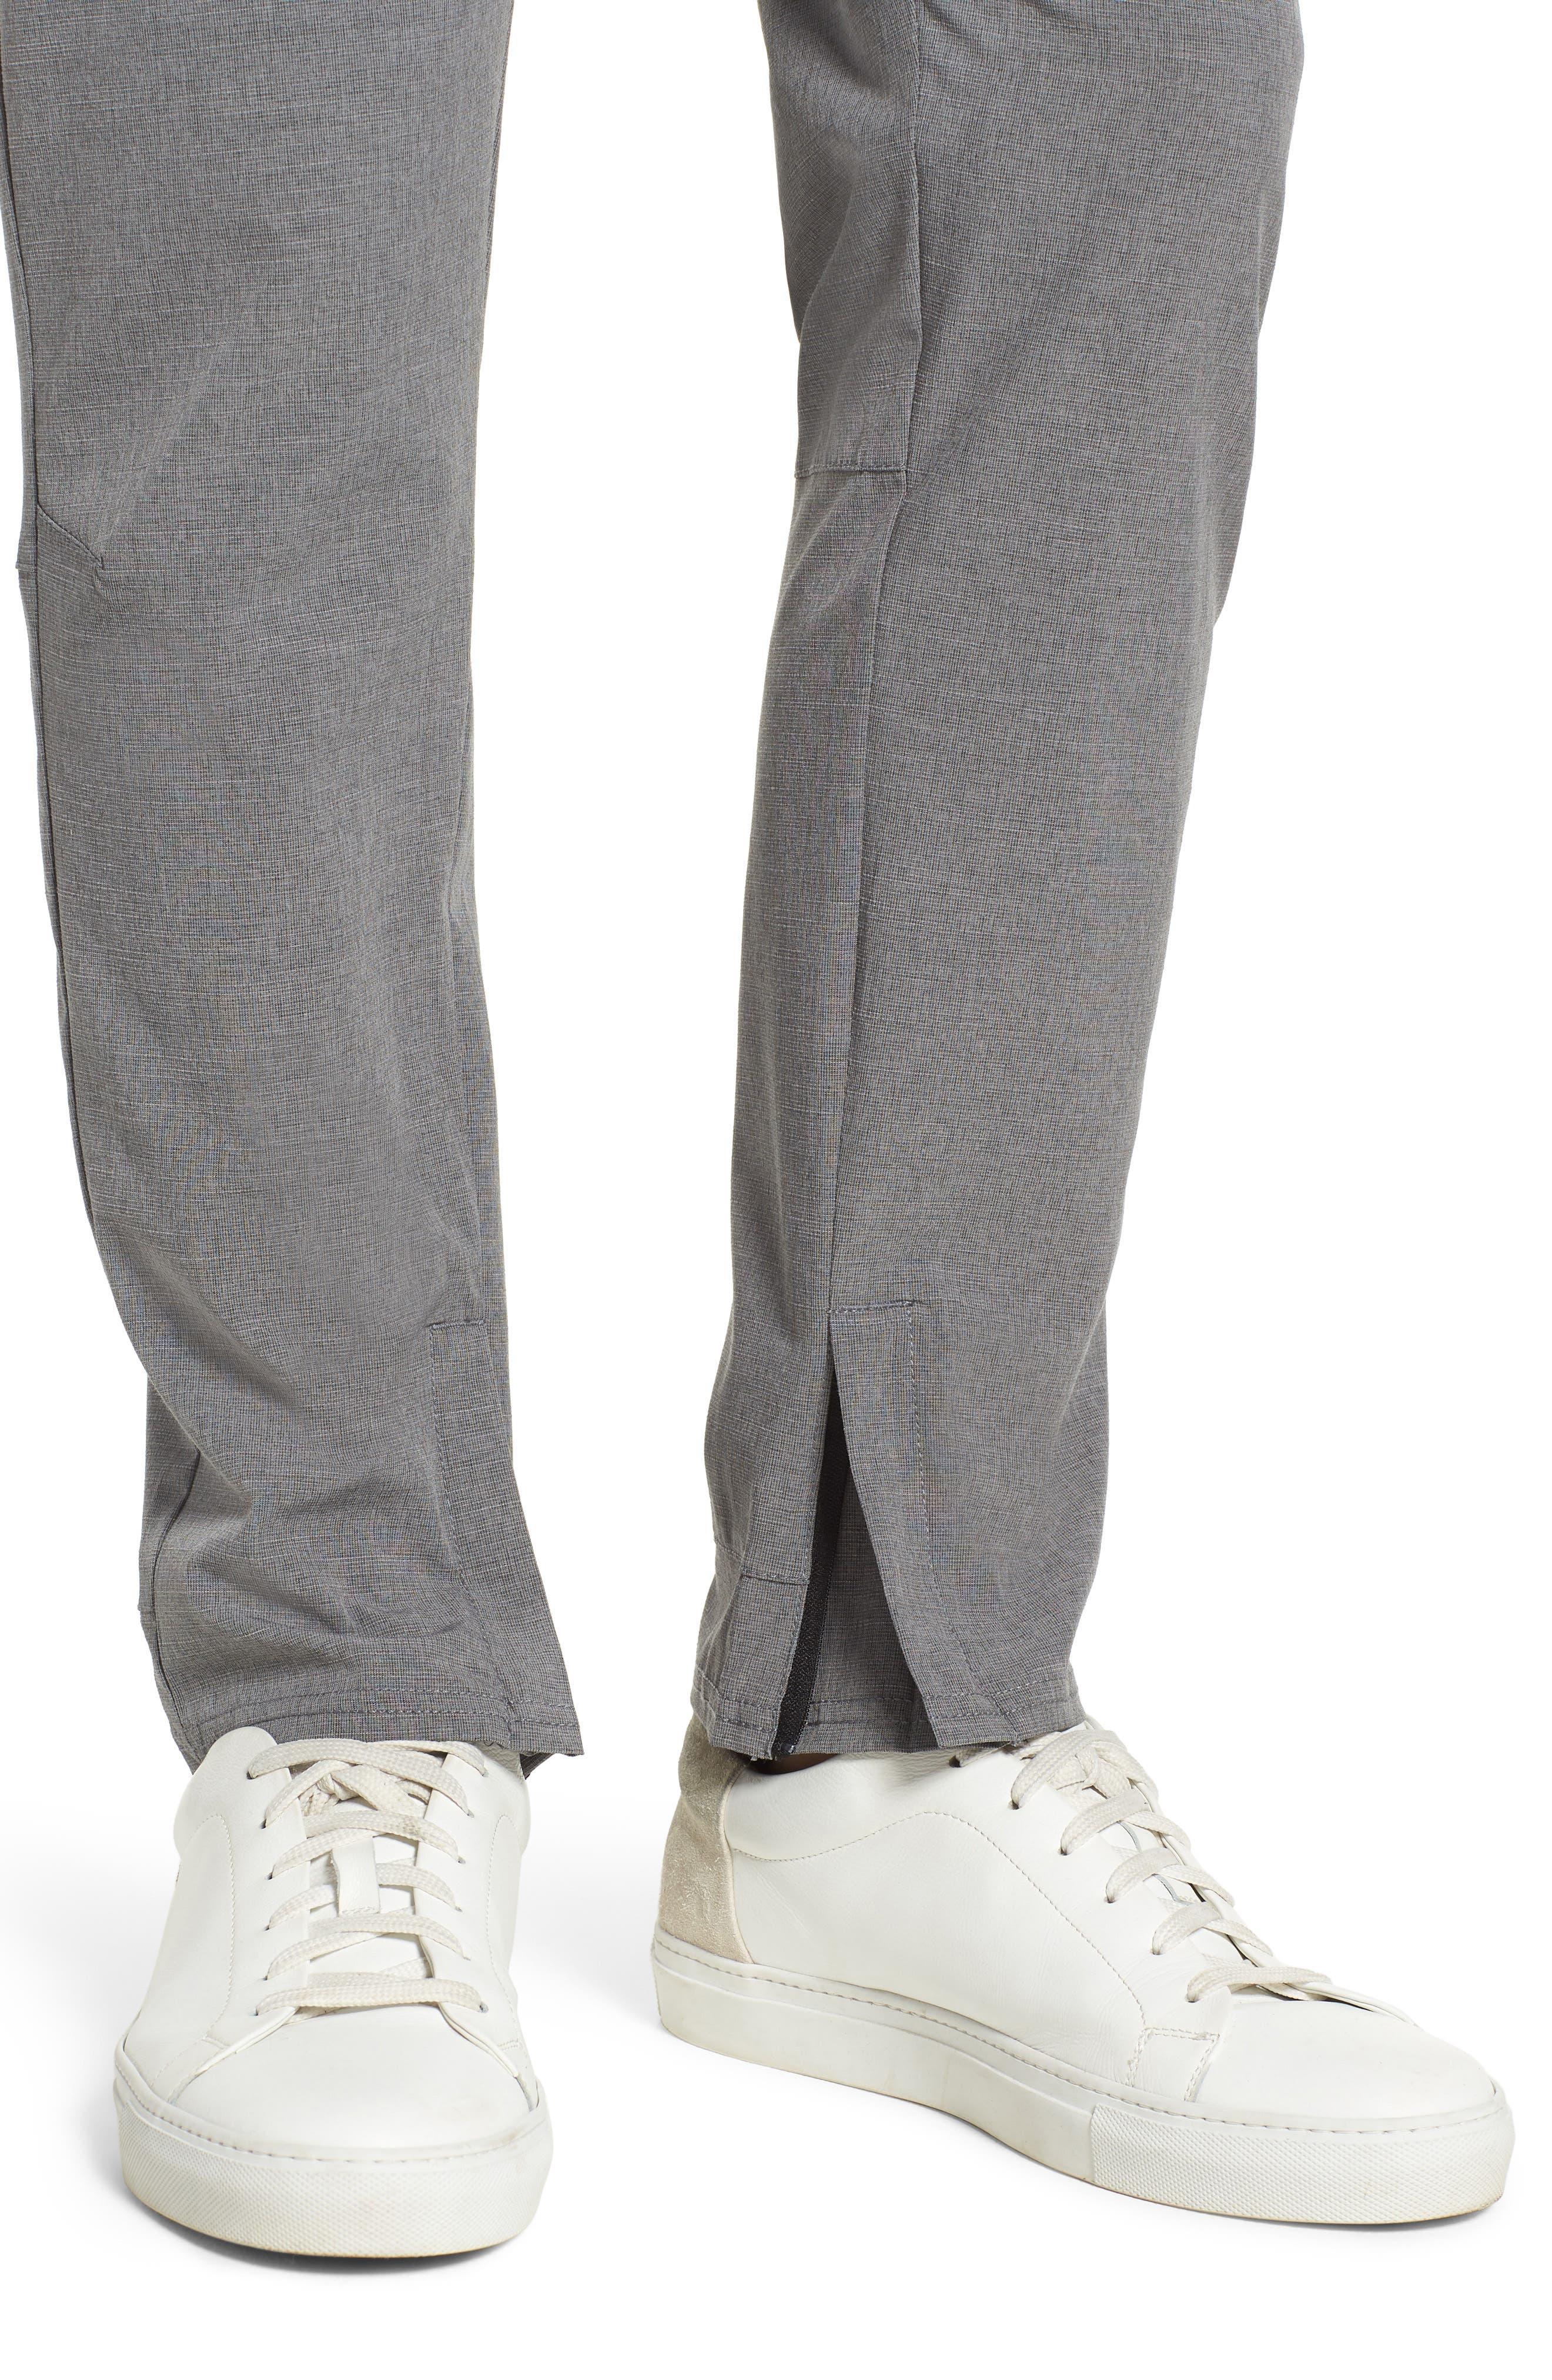 Gravity Athletic Fit Pants,                             Alternate thumbnail 4, color,                             Charcoal